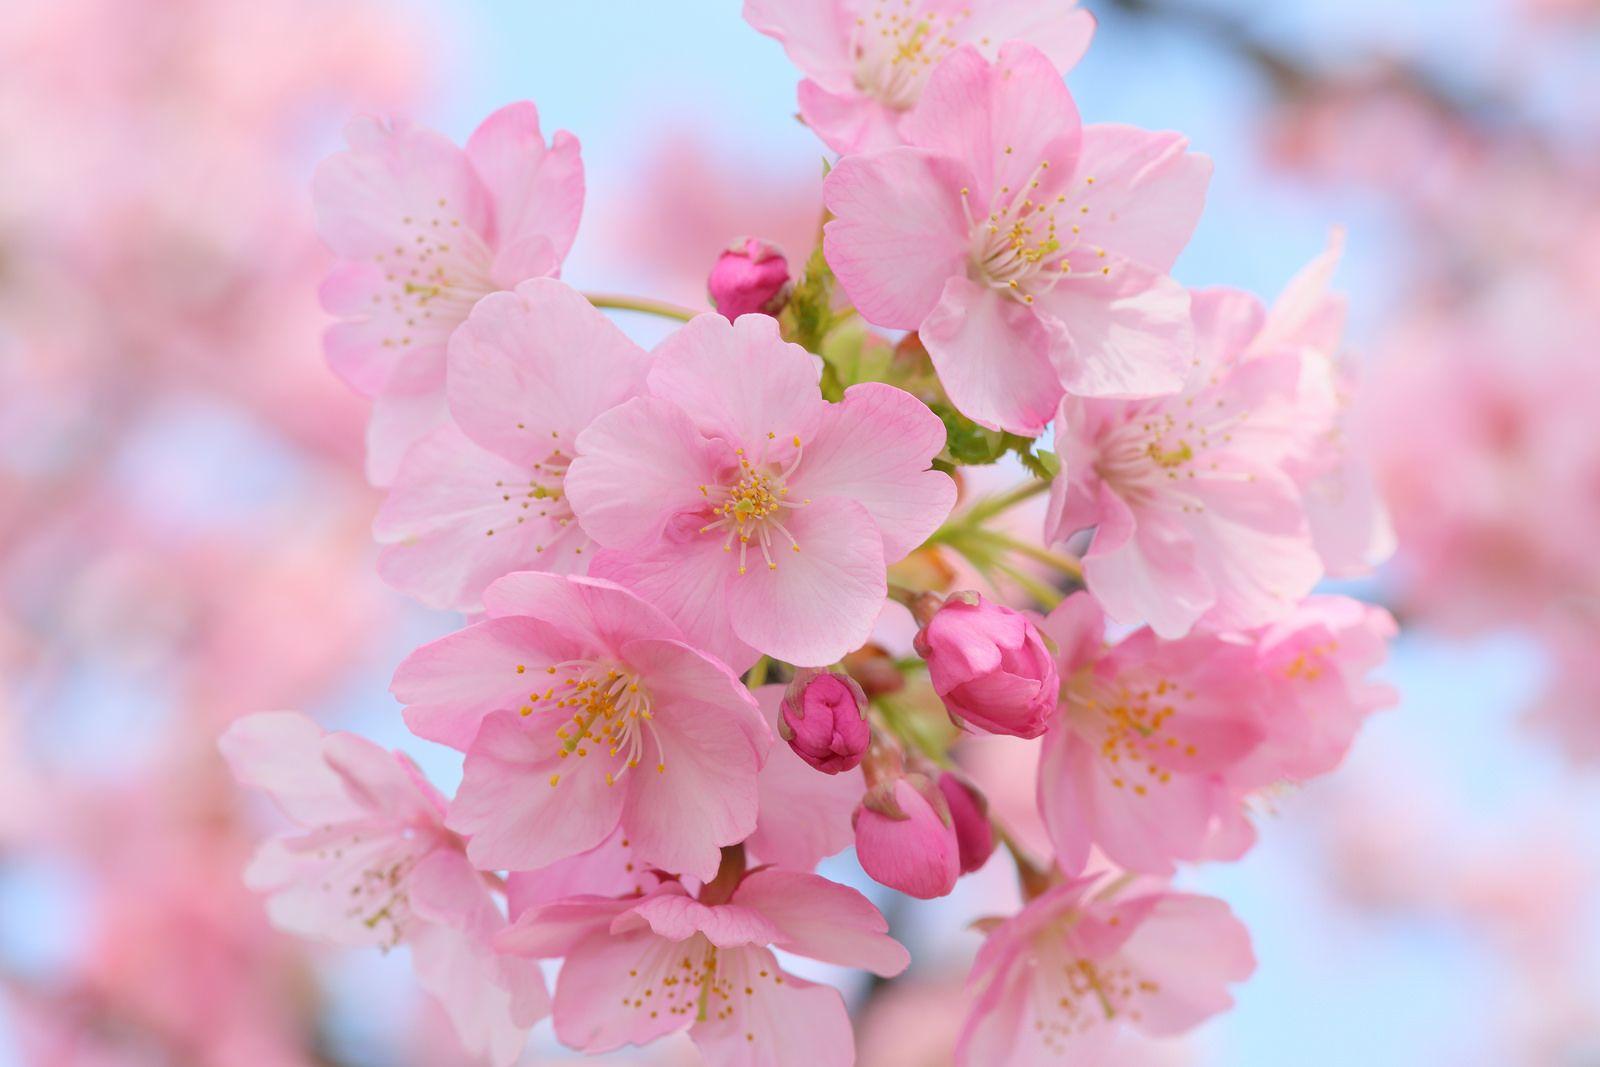 Cherry Blossoms Cherry Blossom Wallpaper Pink Blossom Flowers